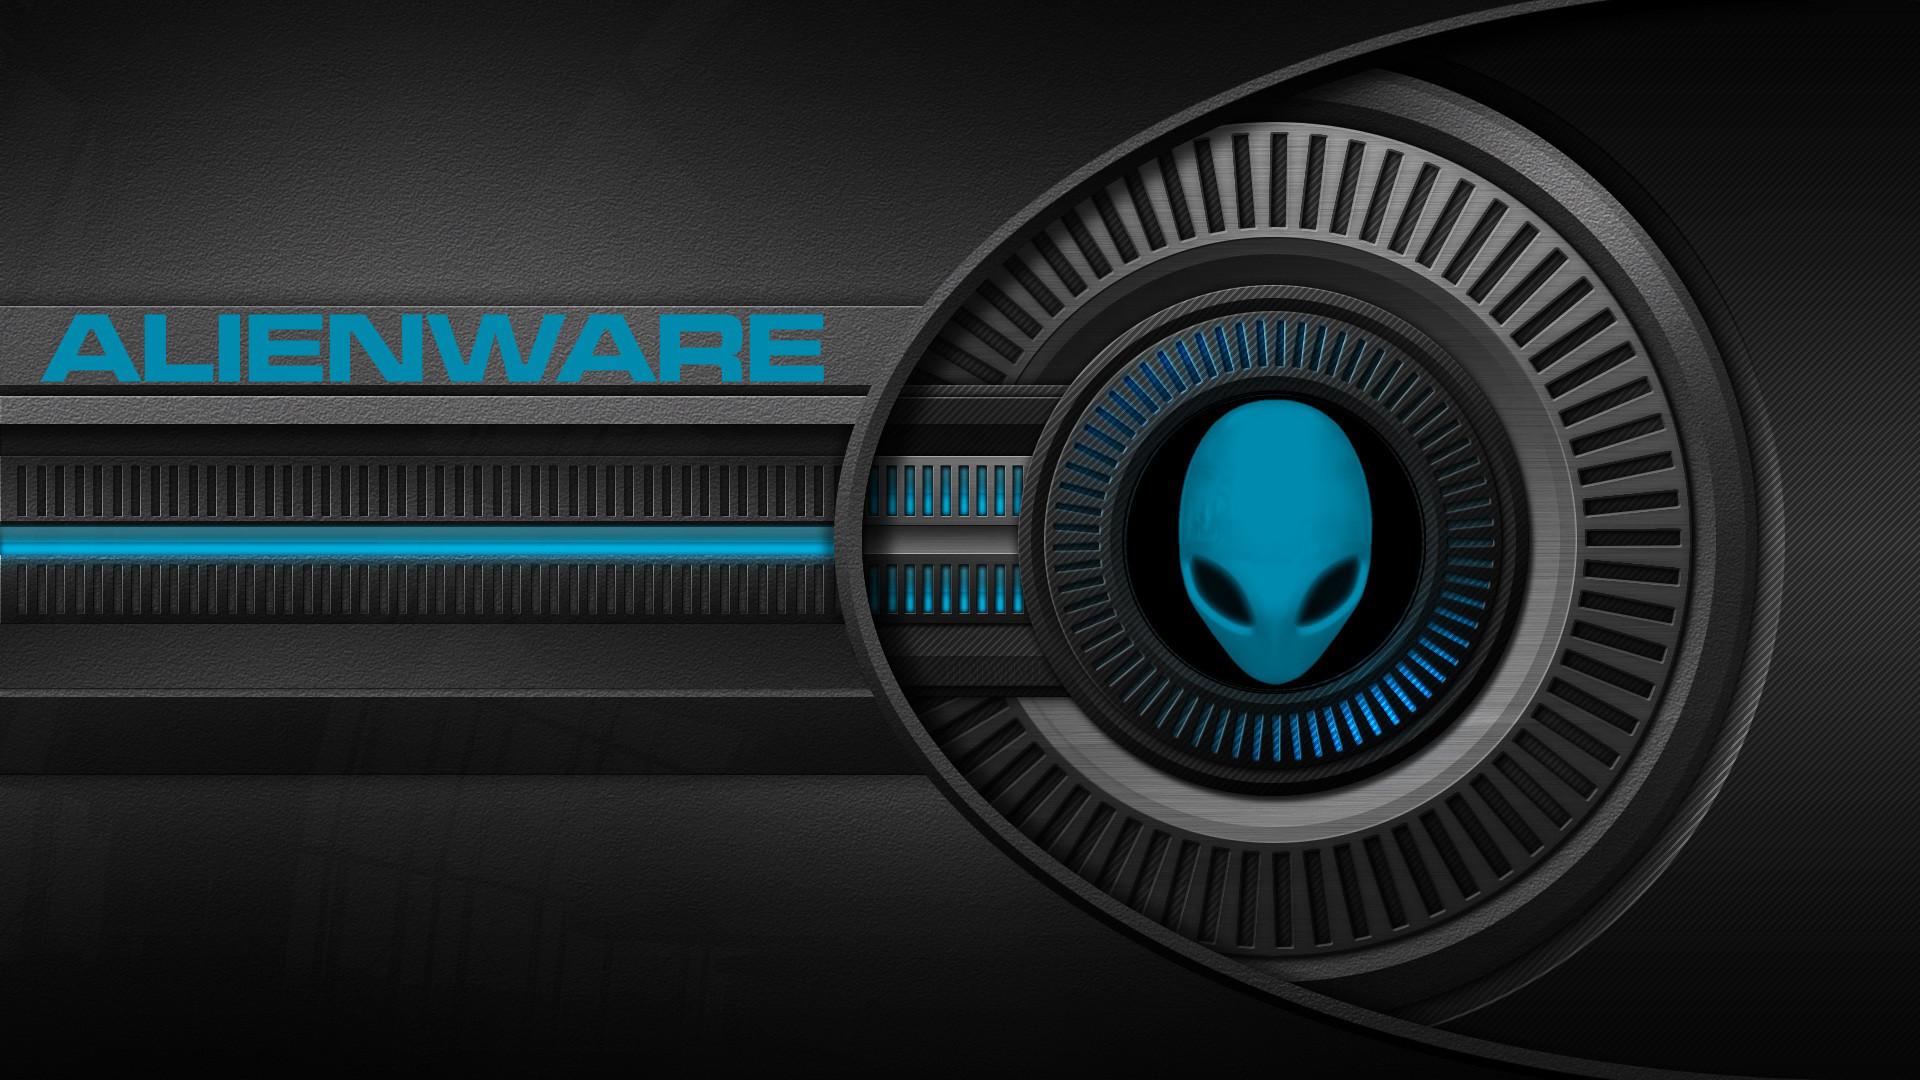 Black And Blue Alienware Wallpaper 14 Desktop Background. Black And Blue  Alienware Wallpaper 14 Desktop Background